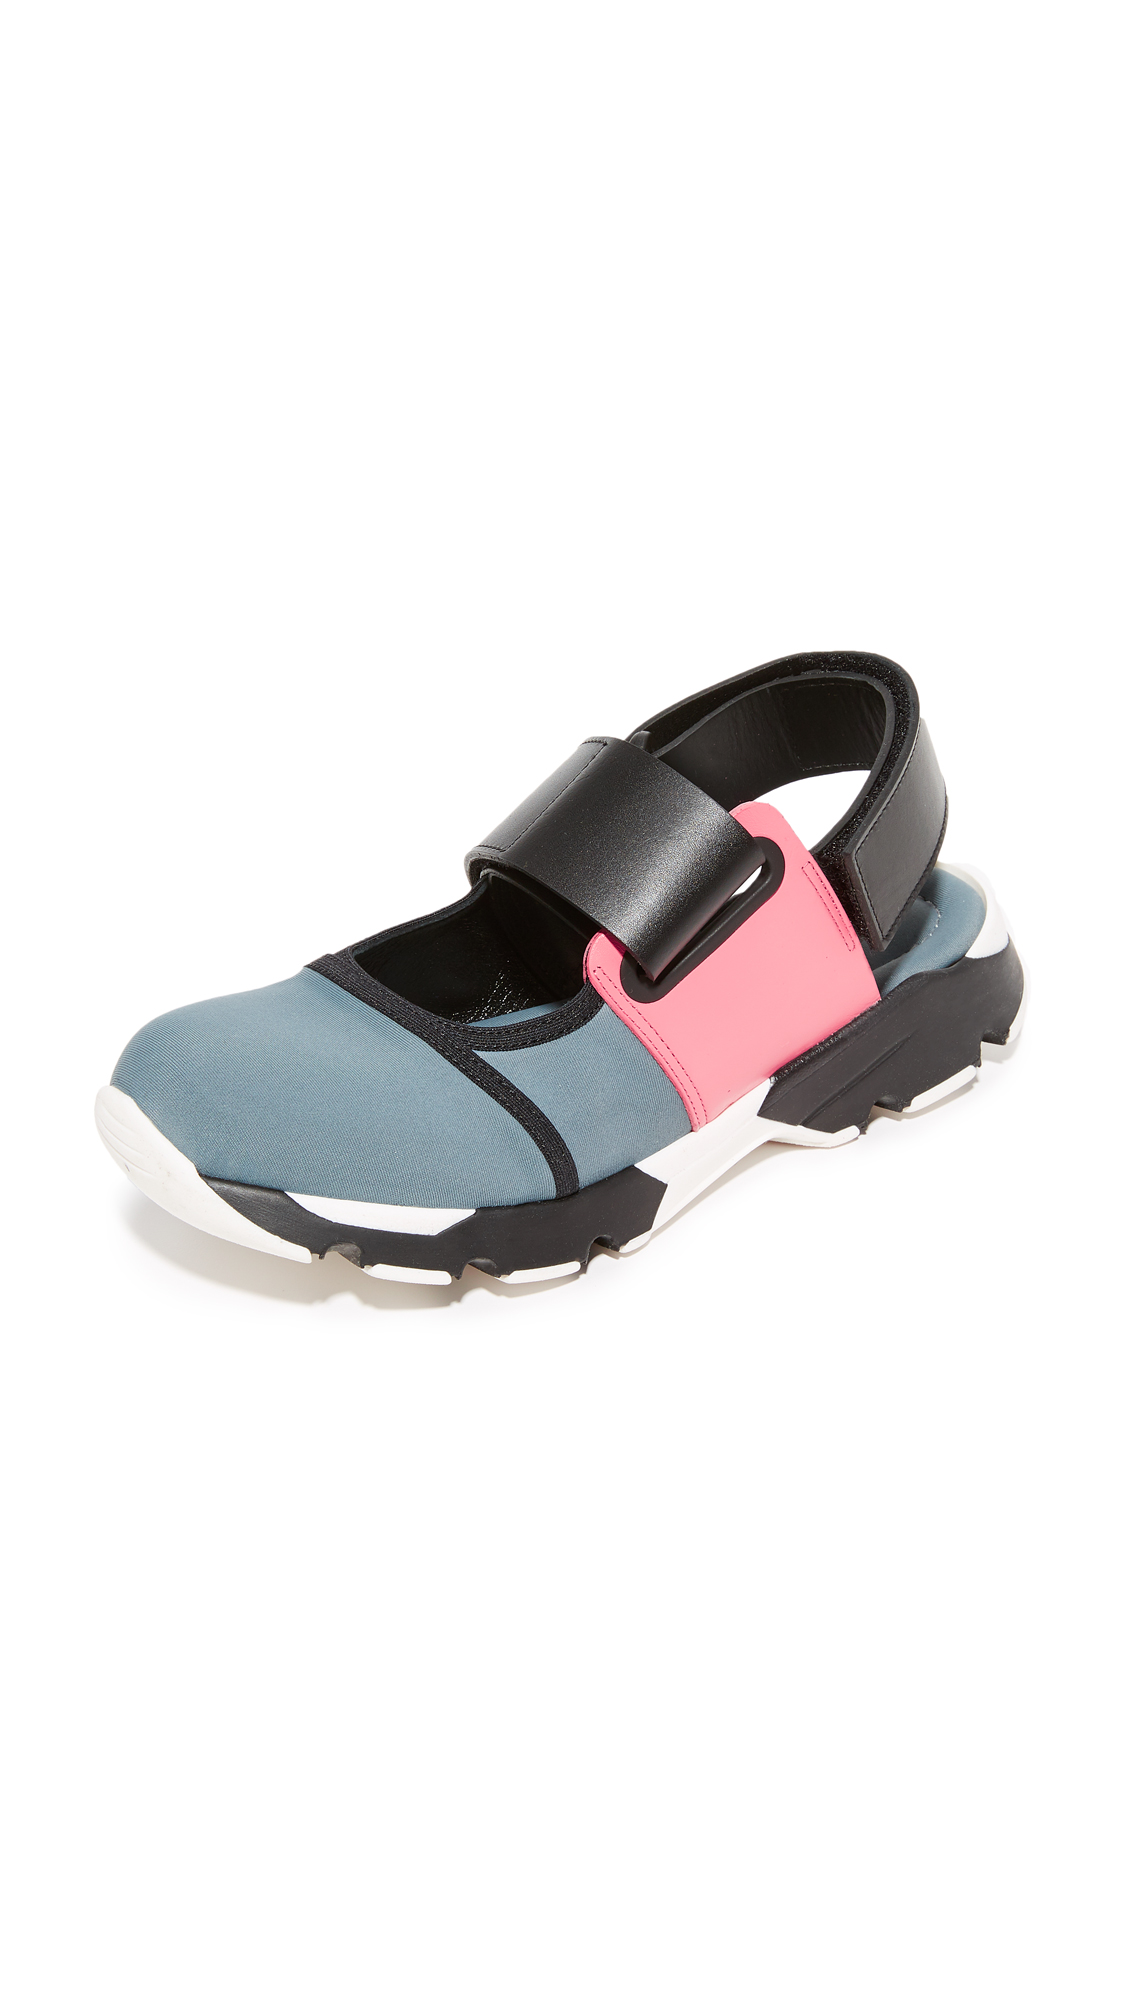 Marni Sneaker Flats - Grey/Camellia/Black